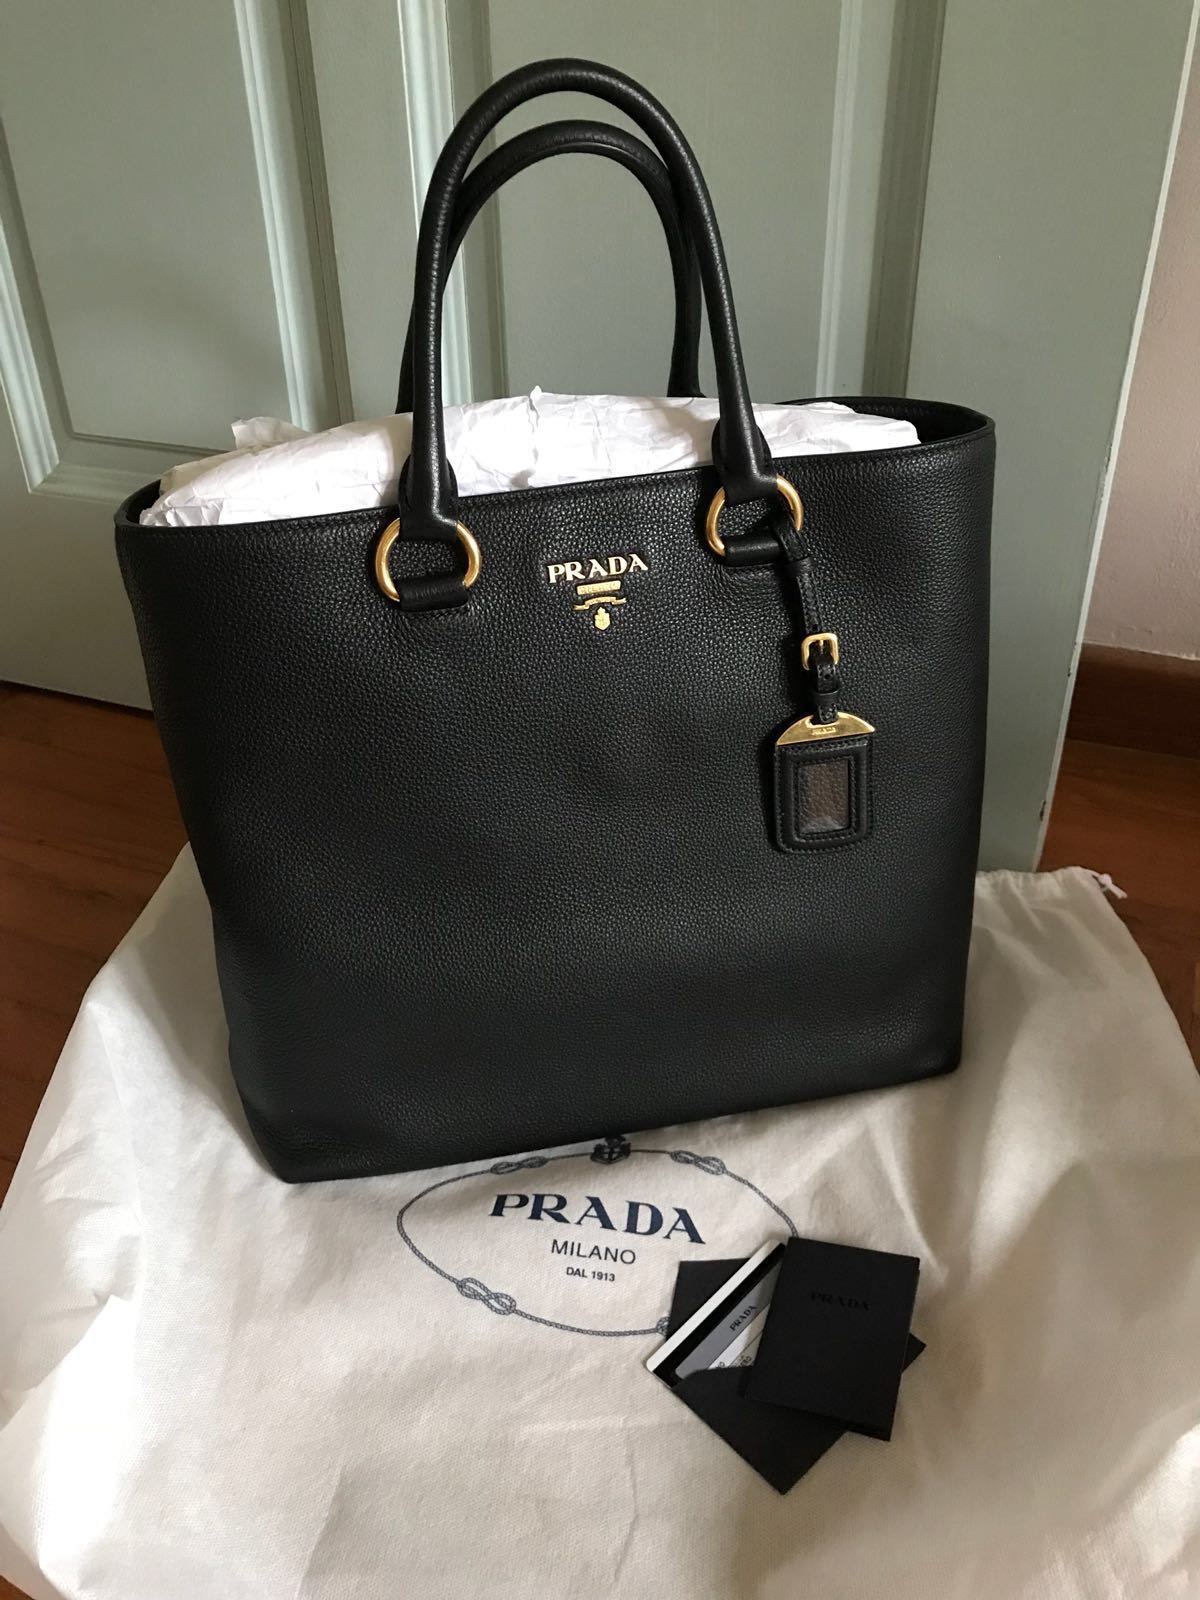 1e398dc590 uk prada milano purse ebay 8bd99 cc676  where to buy authentic prada tote  bag 1bg865 black luxury bags wallets handbags on carousell 76f1e